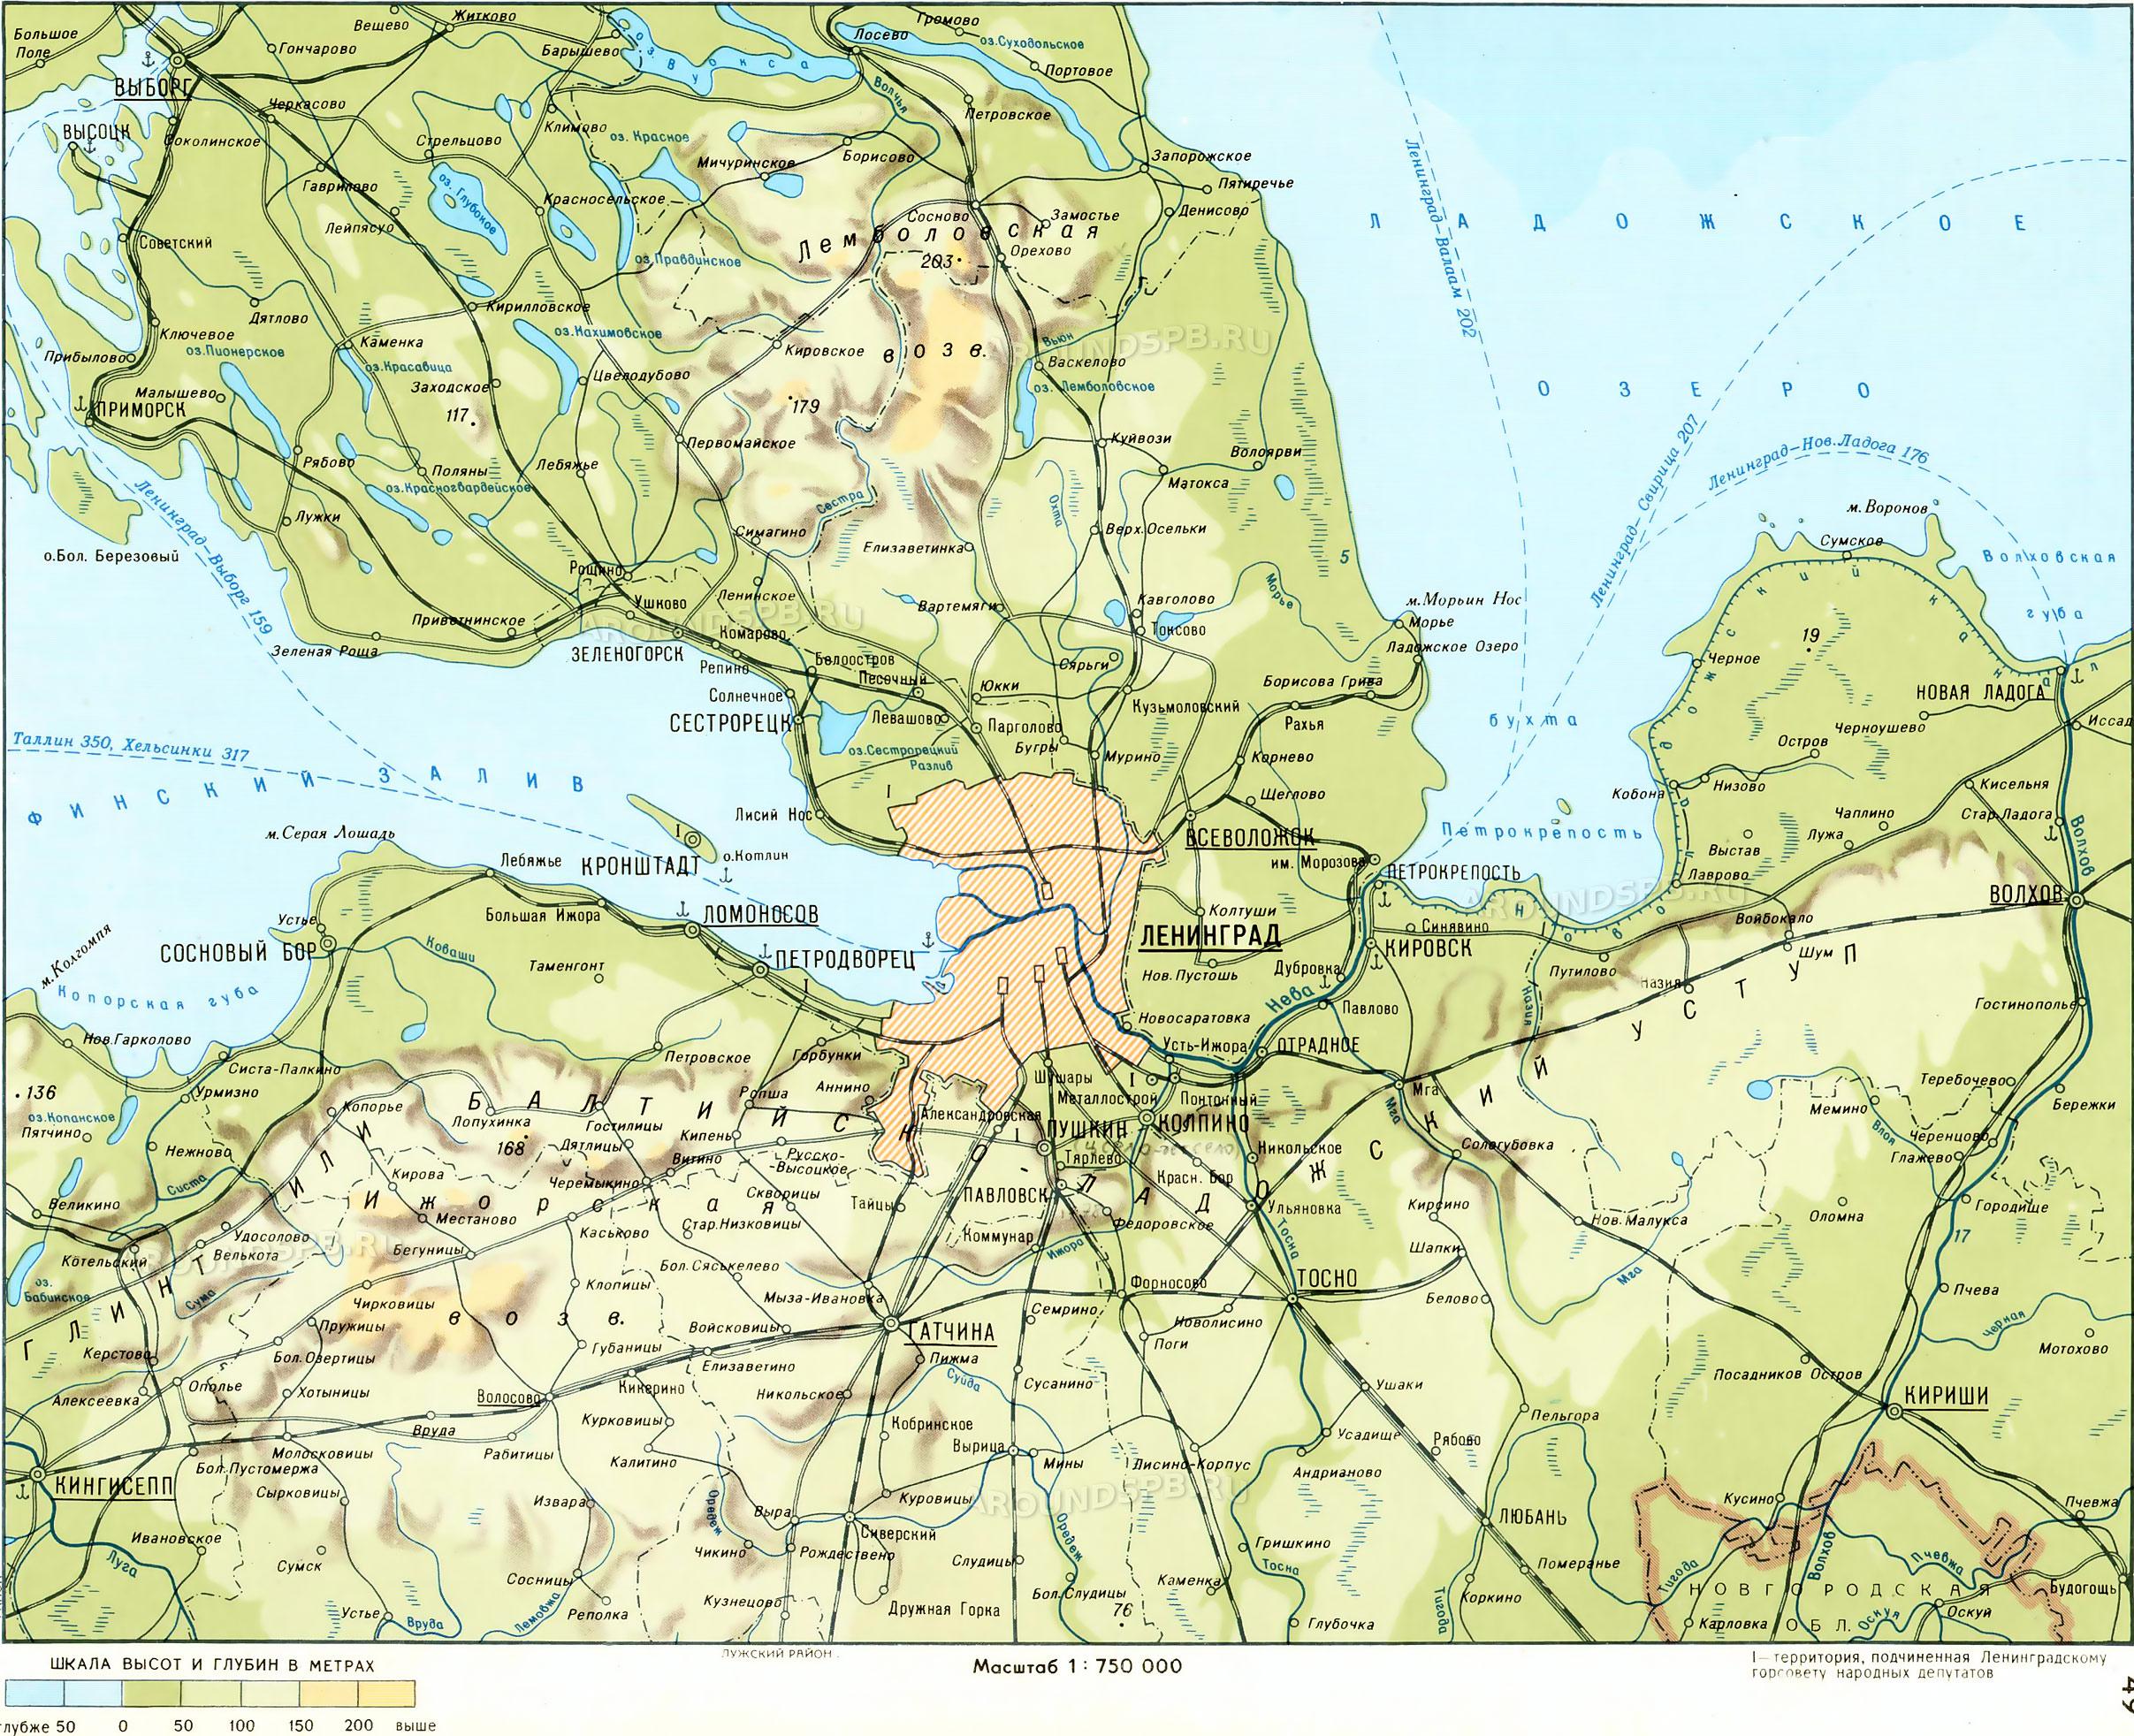 Окрестности Петербурга - Карты местности: Санкт-Петербург ...: http://www.aroundspb.ru/karty/104/lo_1977_atlas.html